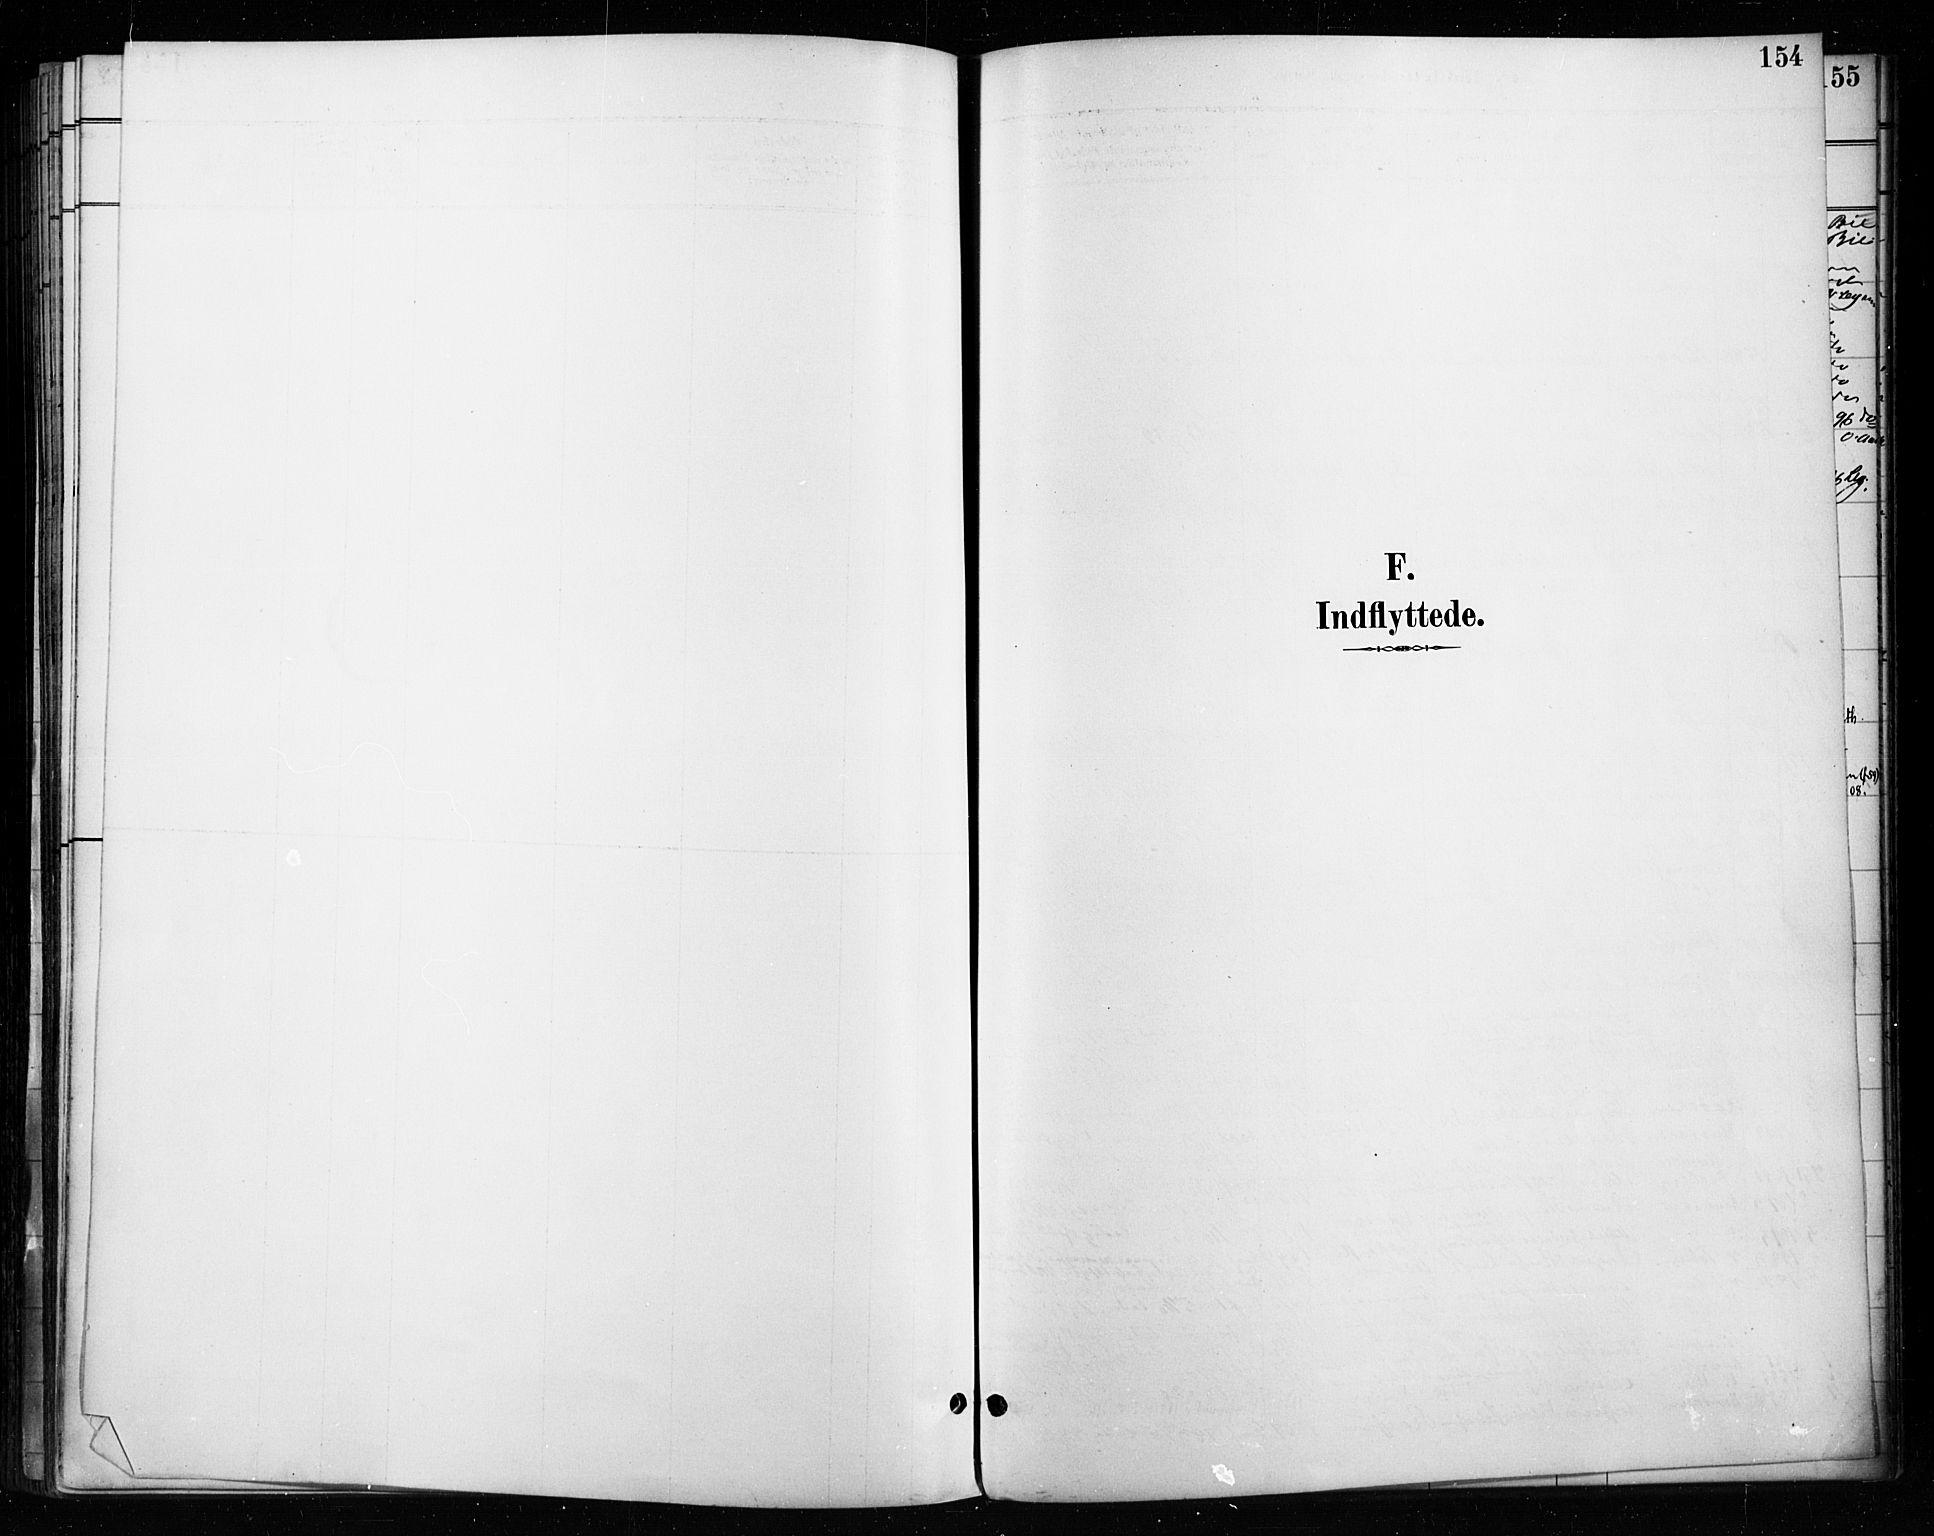 SAH, Gran prestekontor, Ministerialbok nr. 18, 1889-1899, s. 154